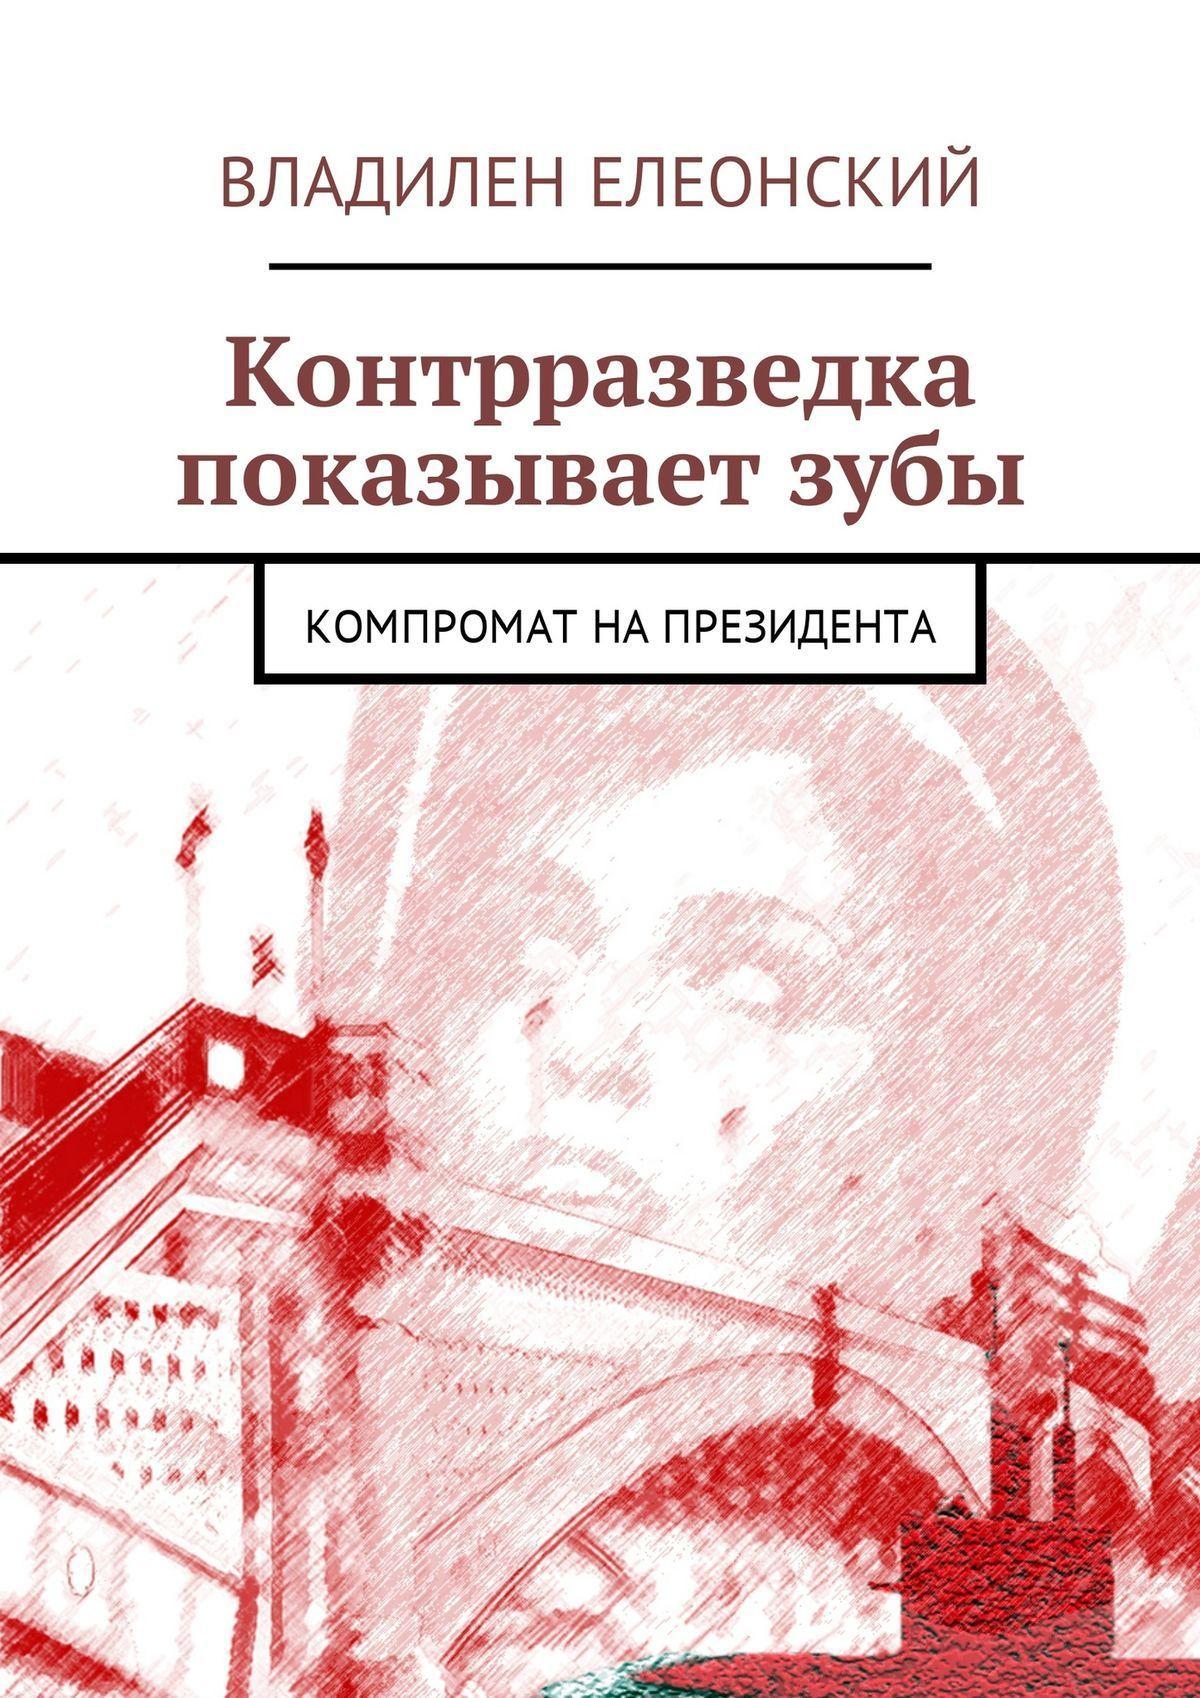 Обложка книги Контрразведка показывает зубы. Компромат на Президента, автор Владилен Елеонский